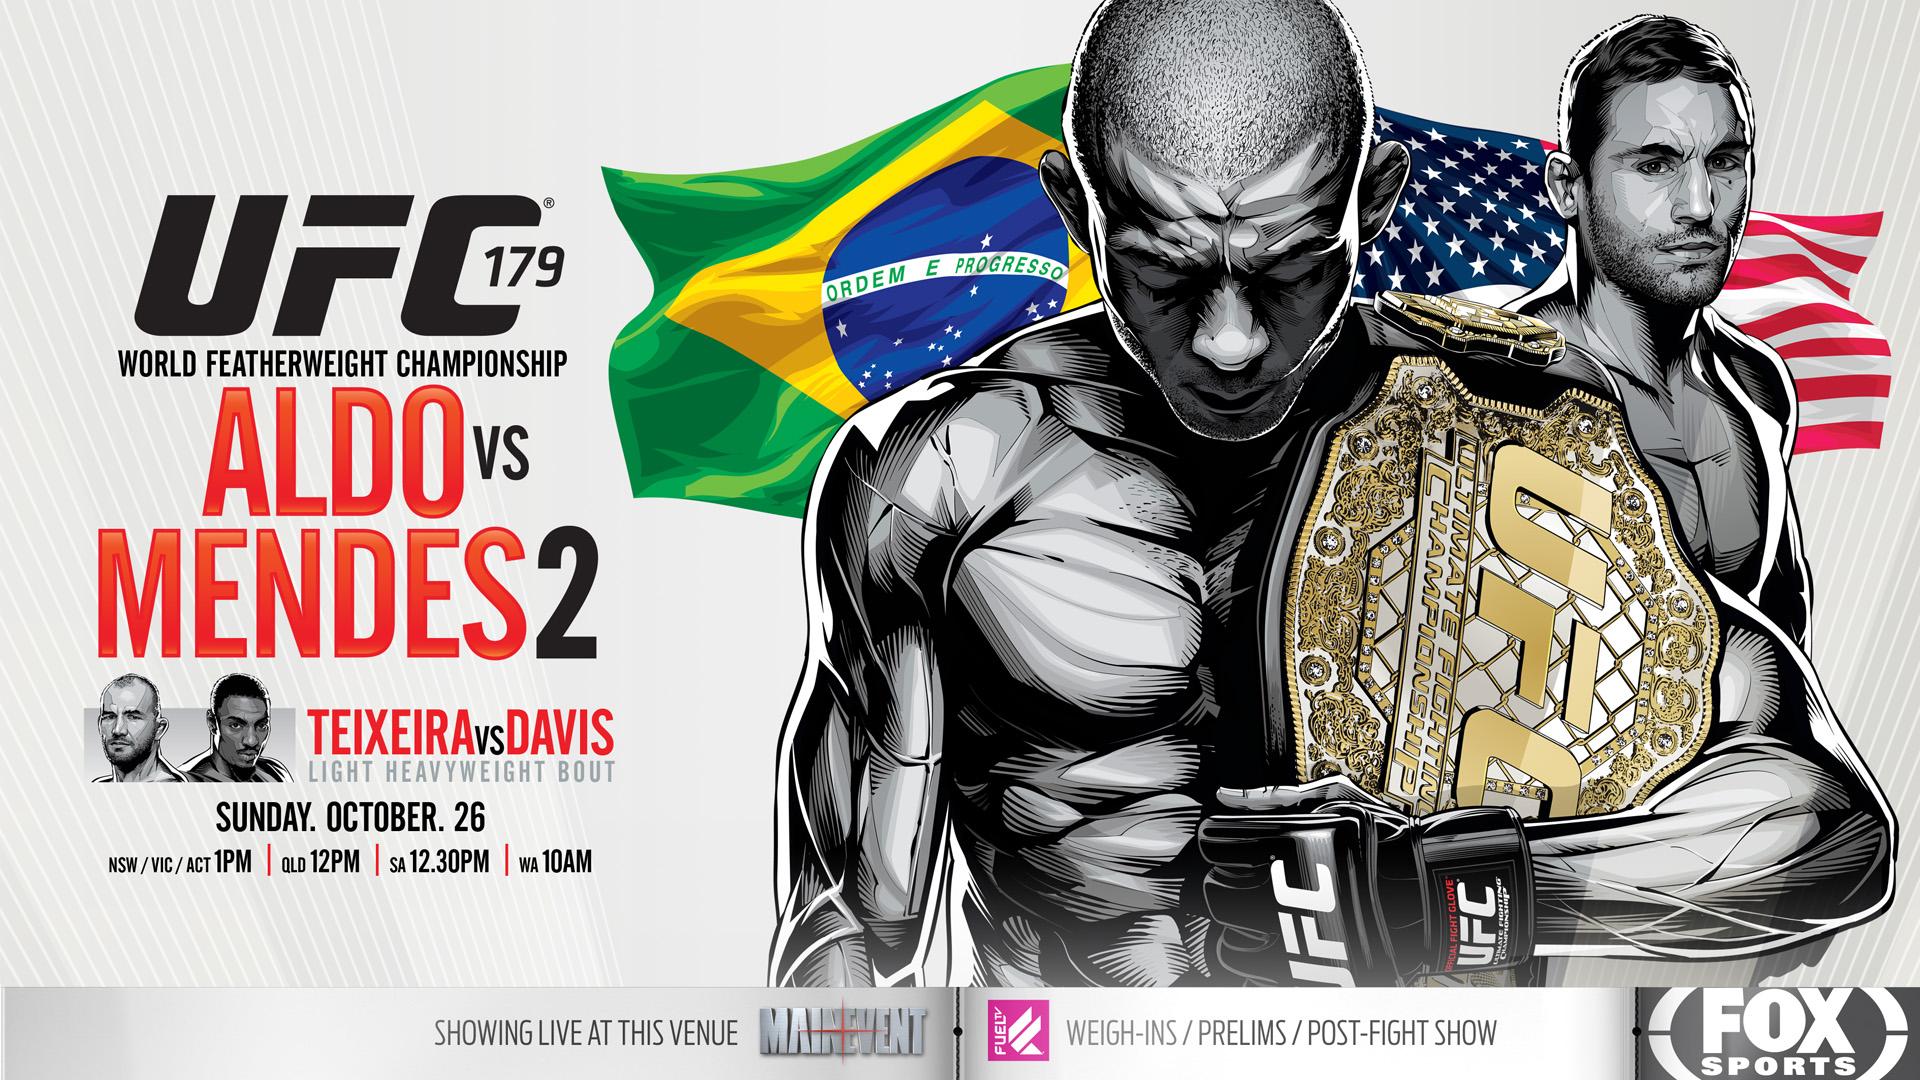 UFC179 FOXSPORTS 16x9